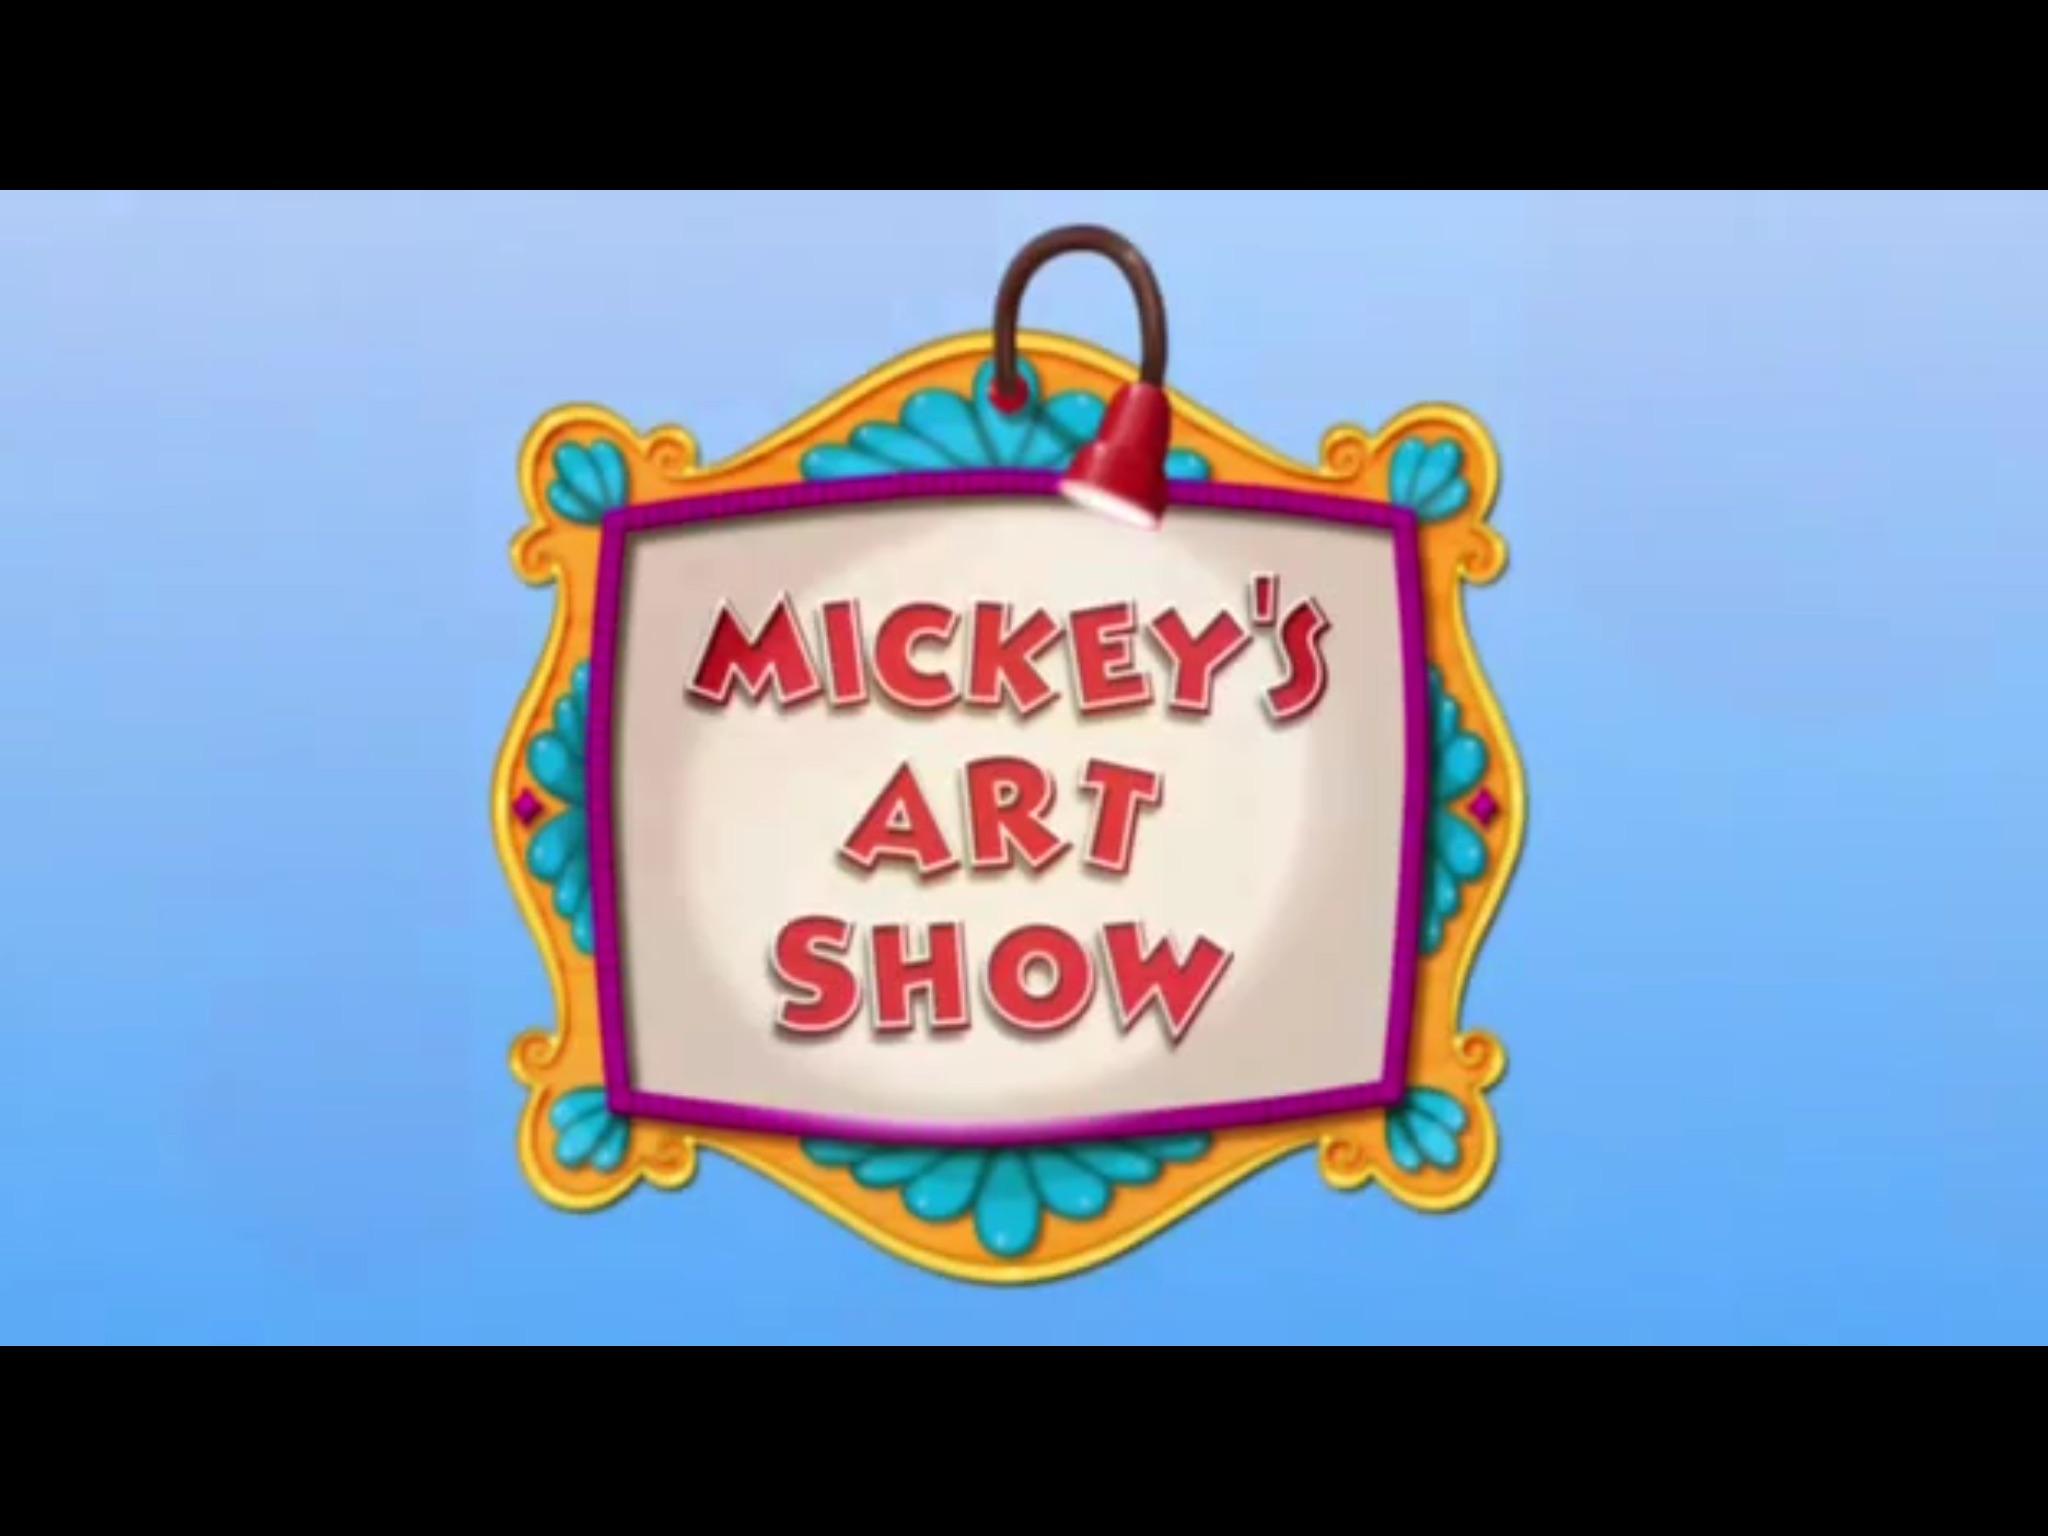 Mickey's Art Show